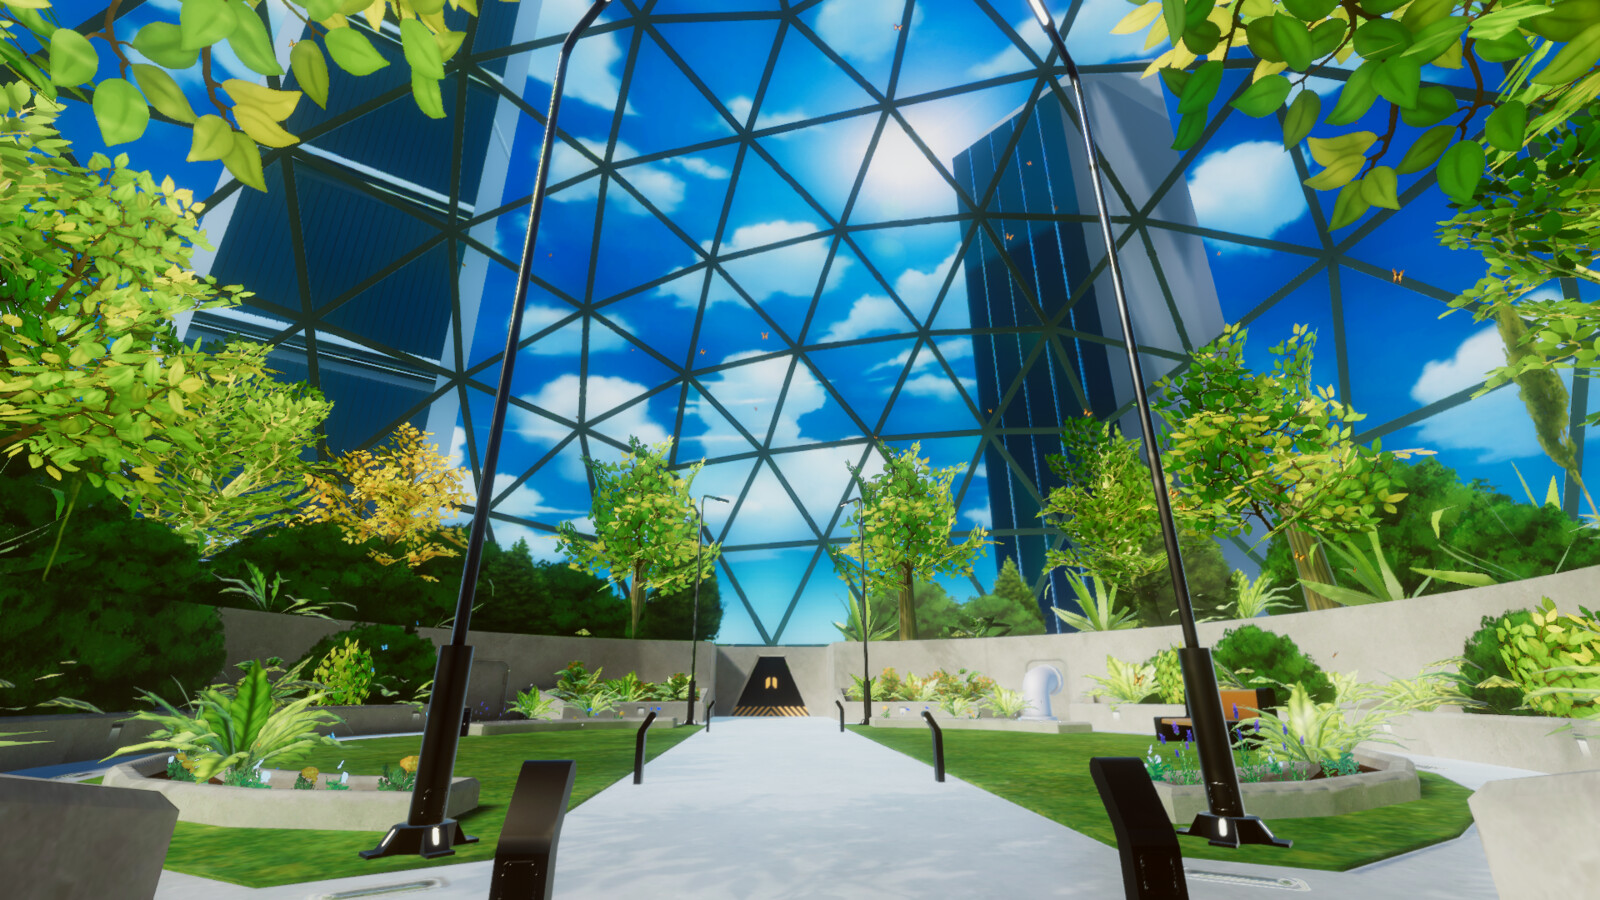 VR mobile stylized enviro dome park 1